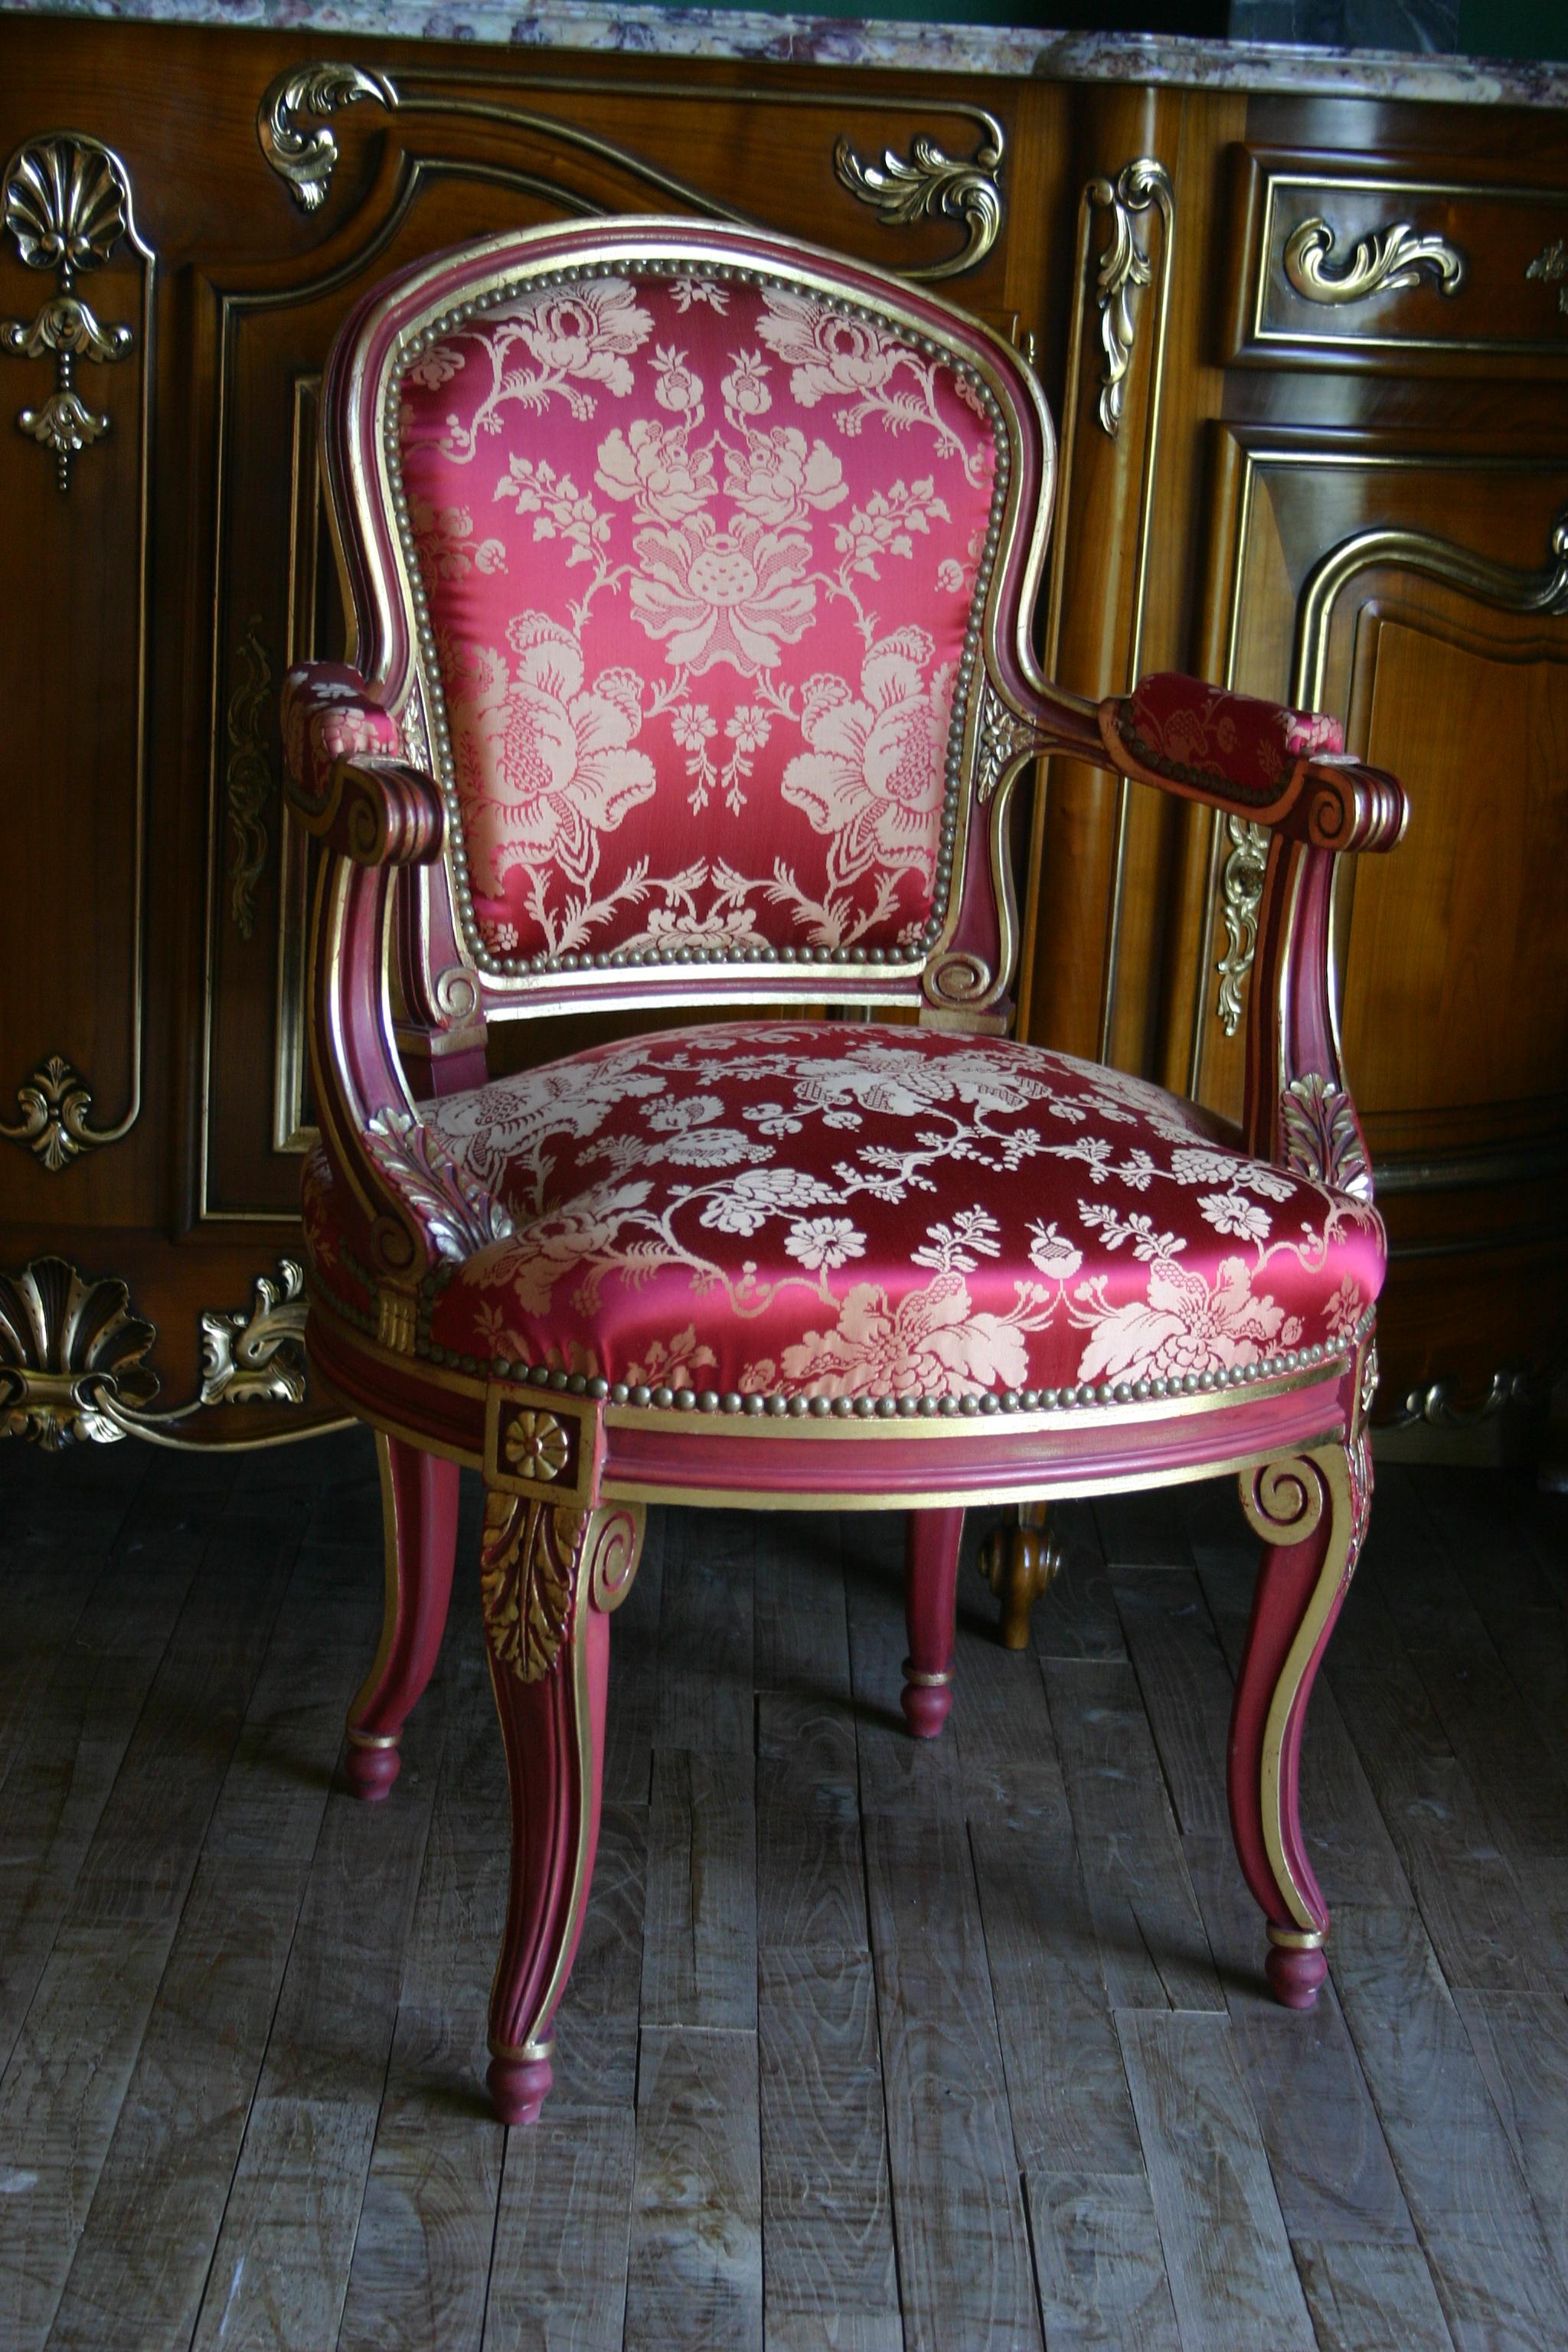 mobilier industriel mobilier d 39 usine mobilier loft meubles images frompo. Black Bedroom Furniture Sets. Home Design Ideas